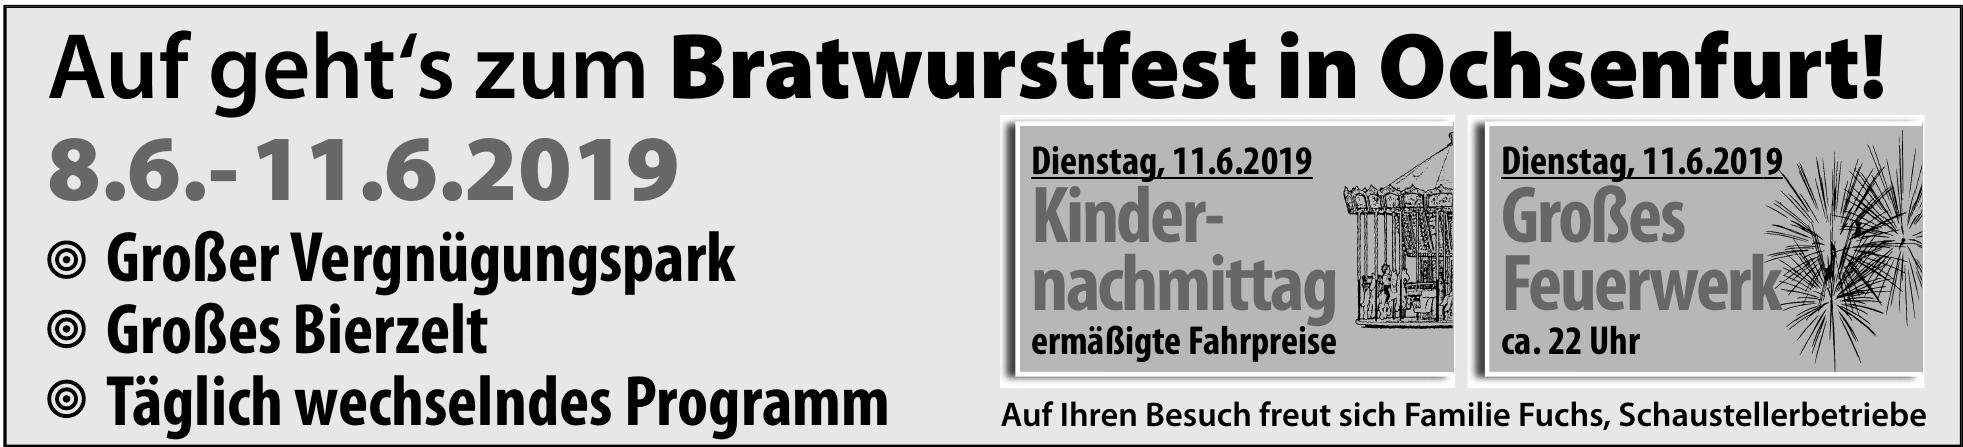 Bratwurstfest in Ochsenfurt